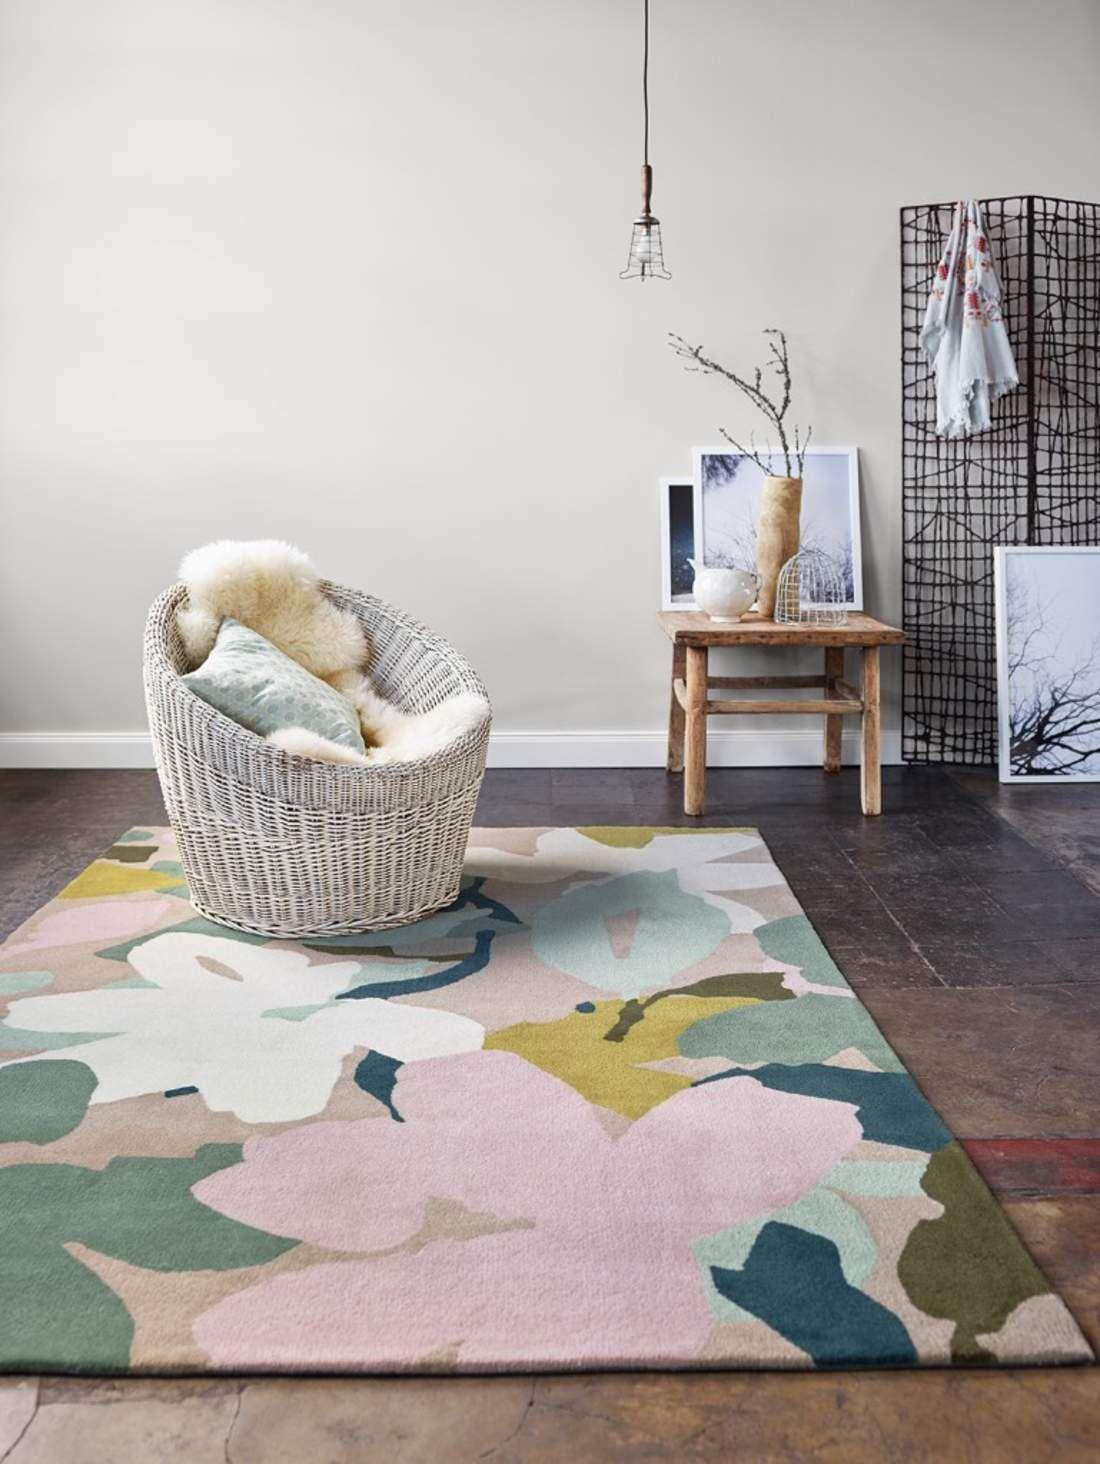 This Bloom Esp 4204 01 Carpet Is Designed In Europe By Esprit